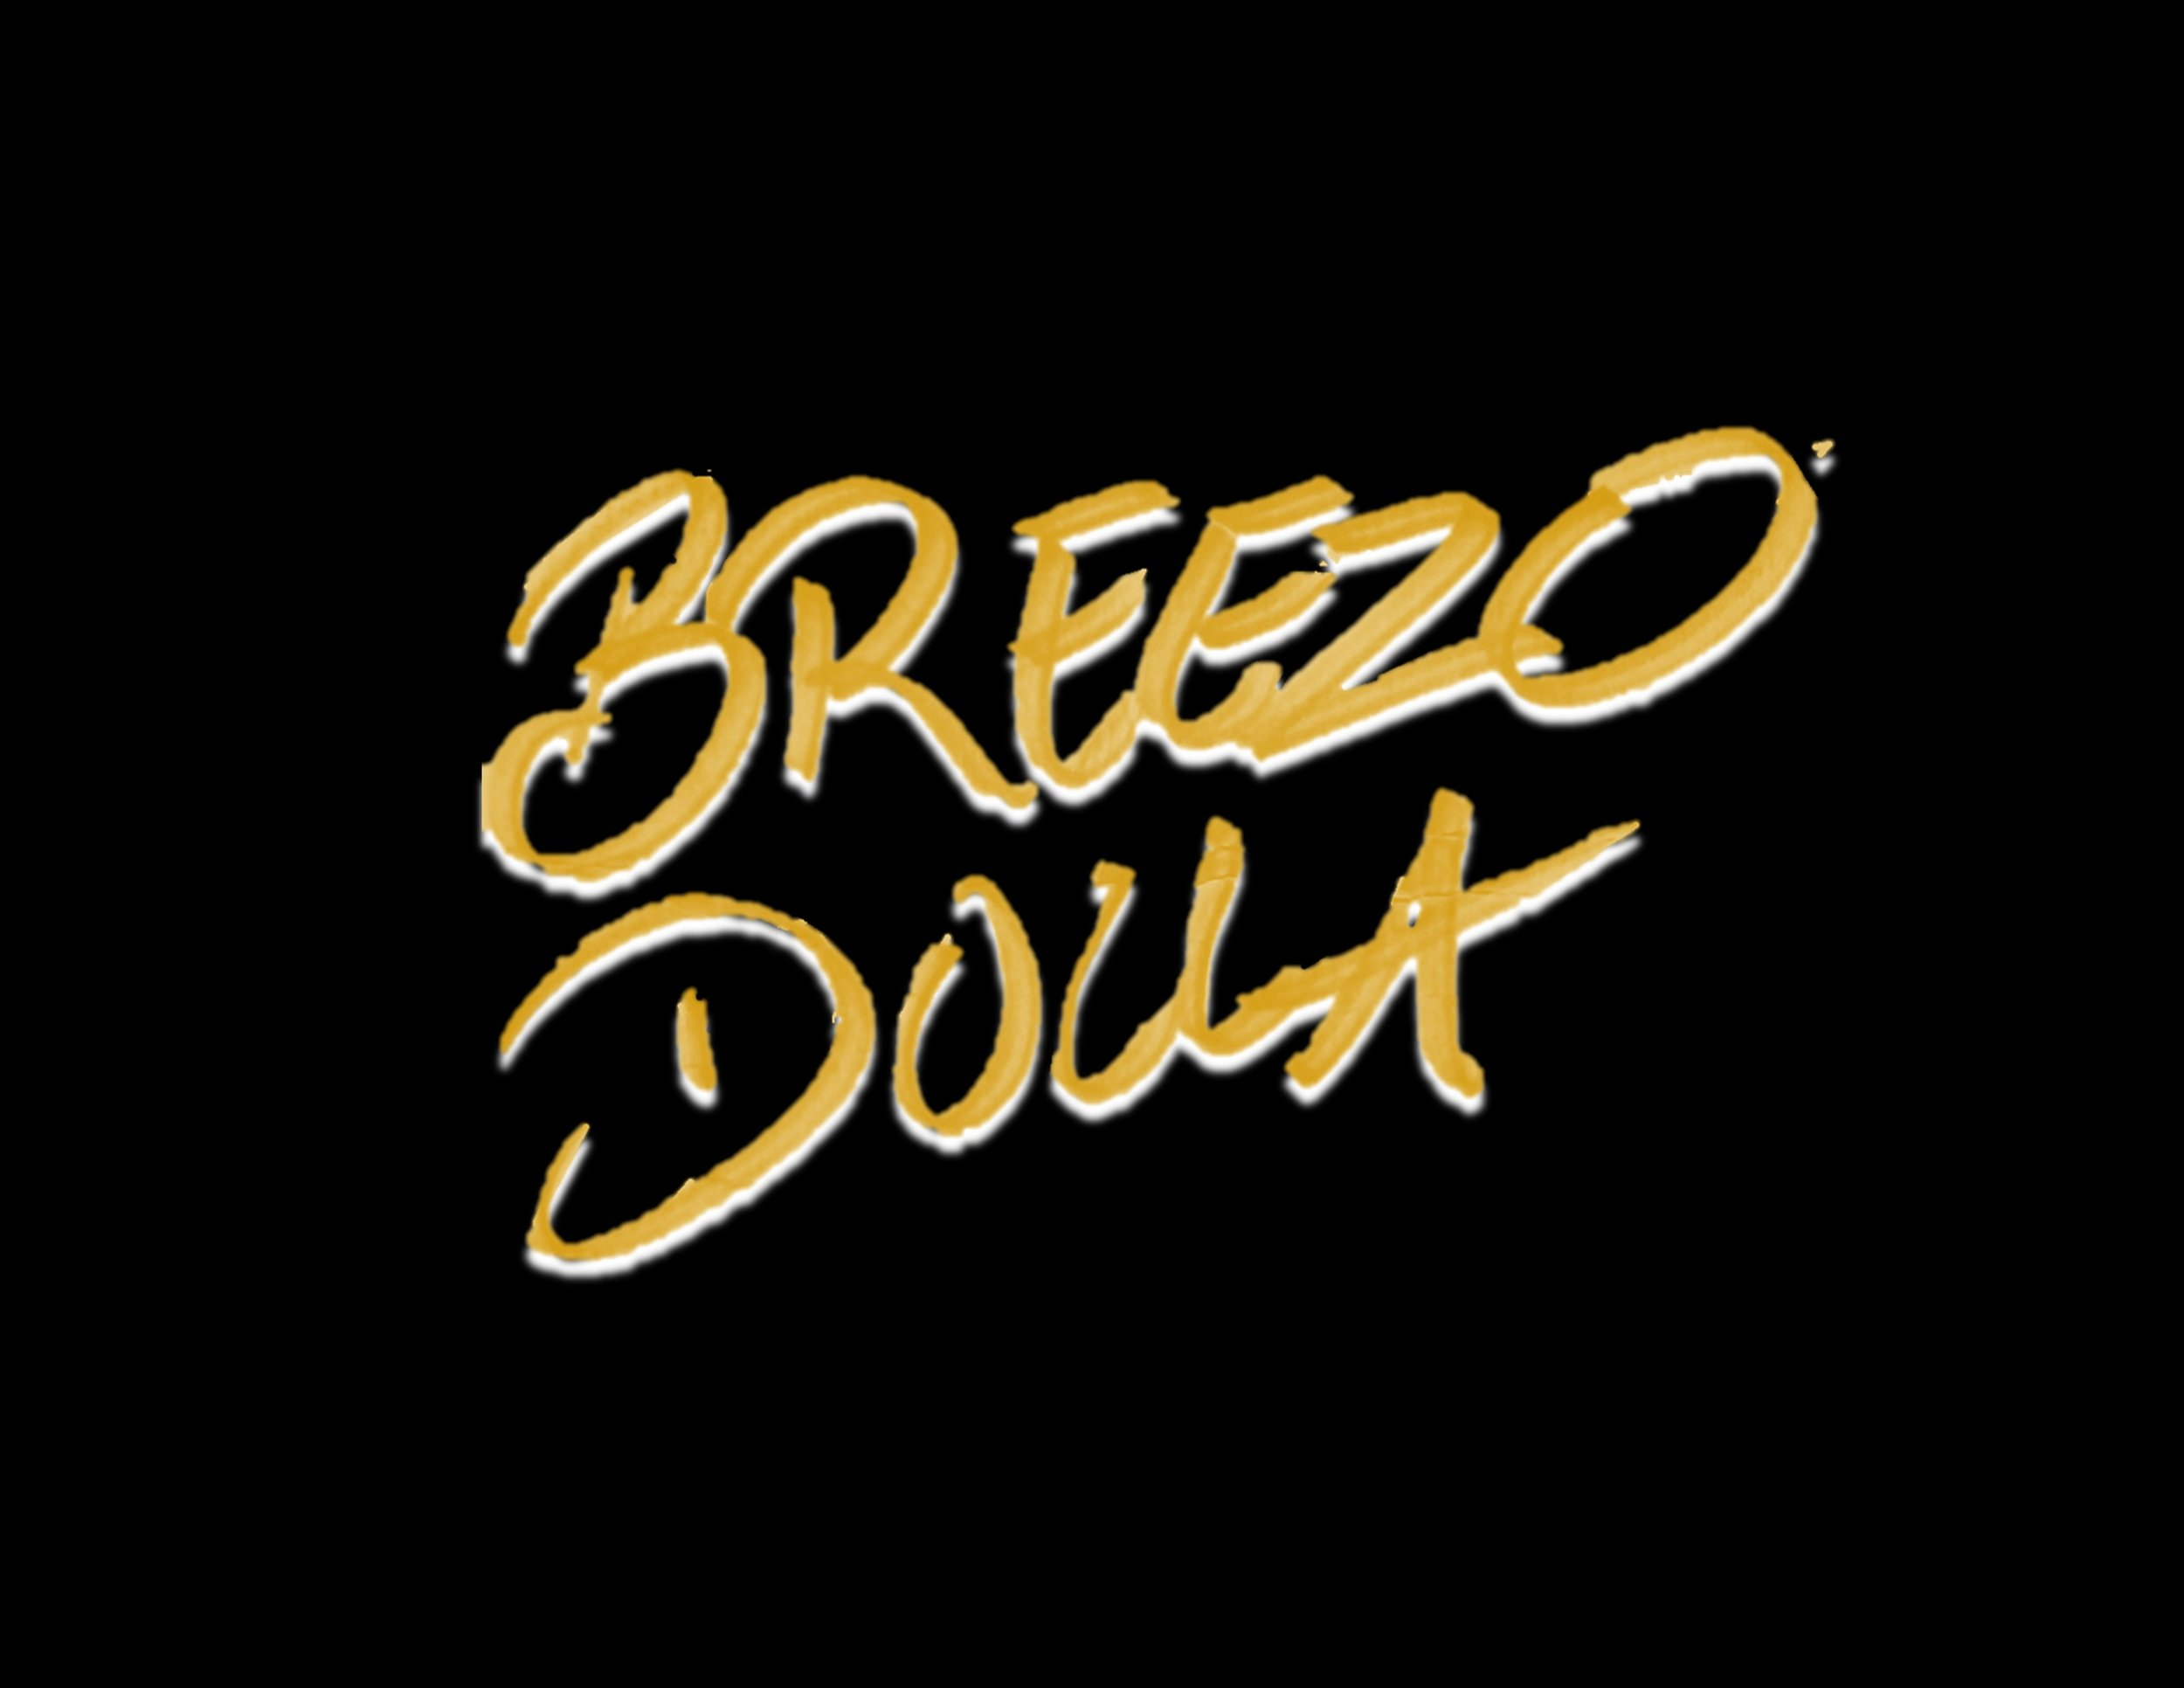 Breezo Dolla Final Logo-Black.jpg